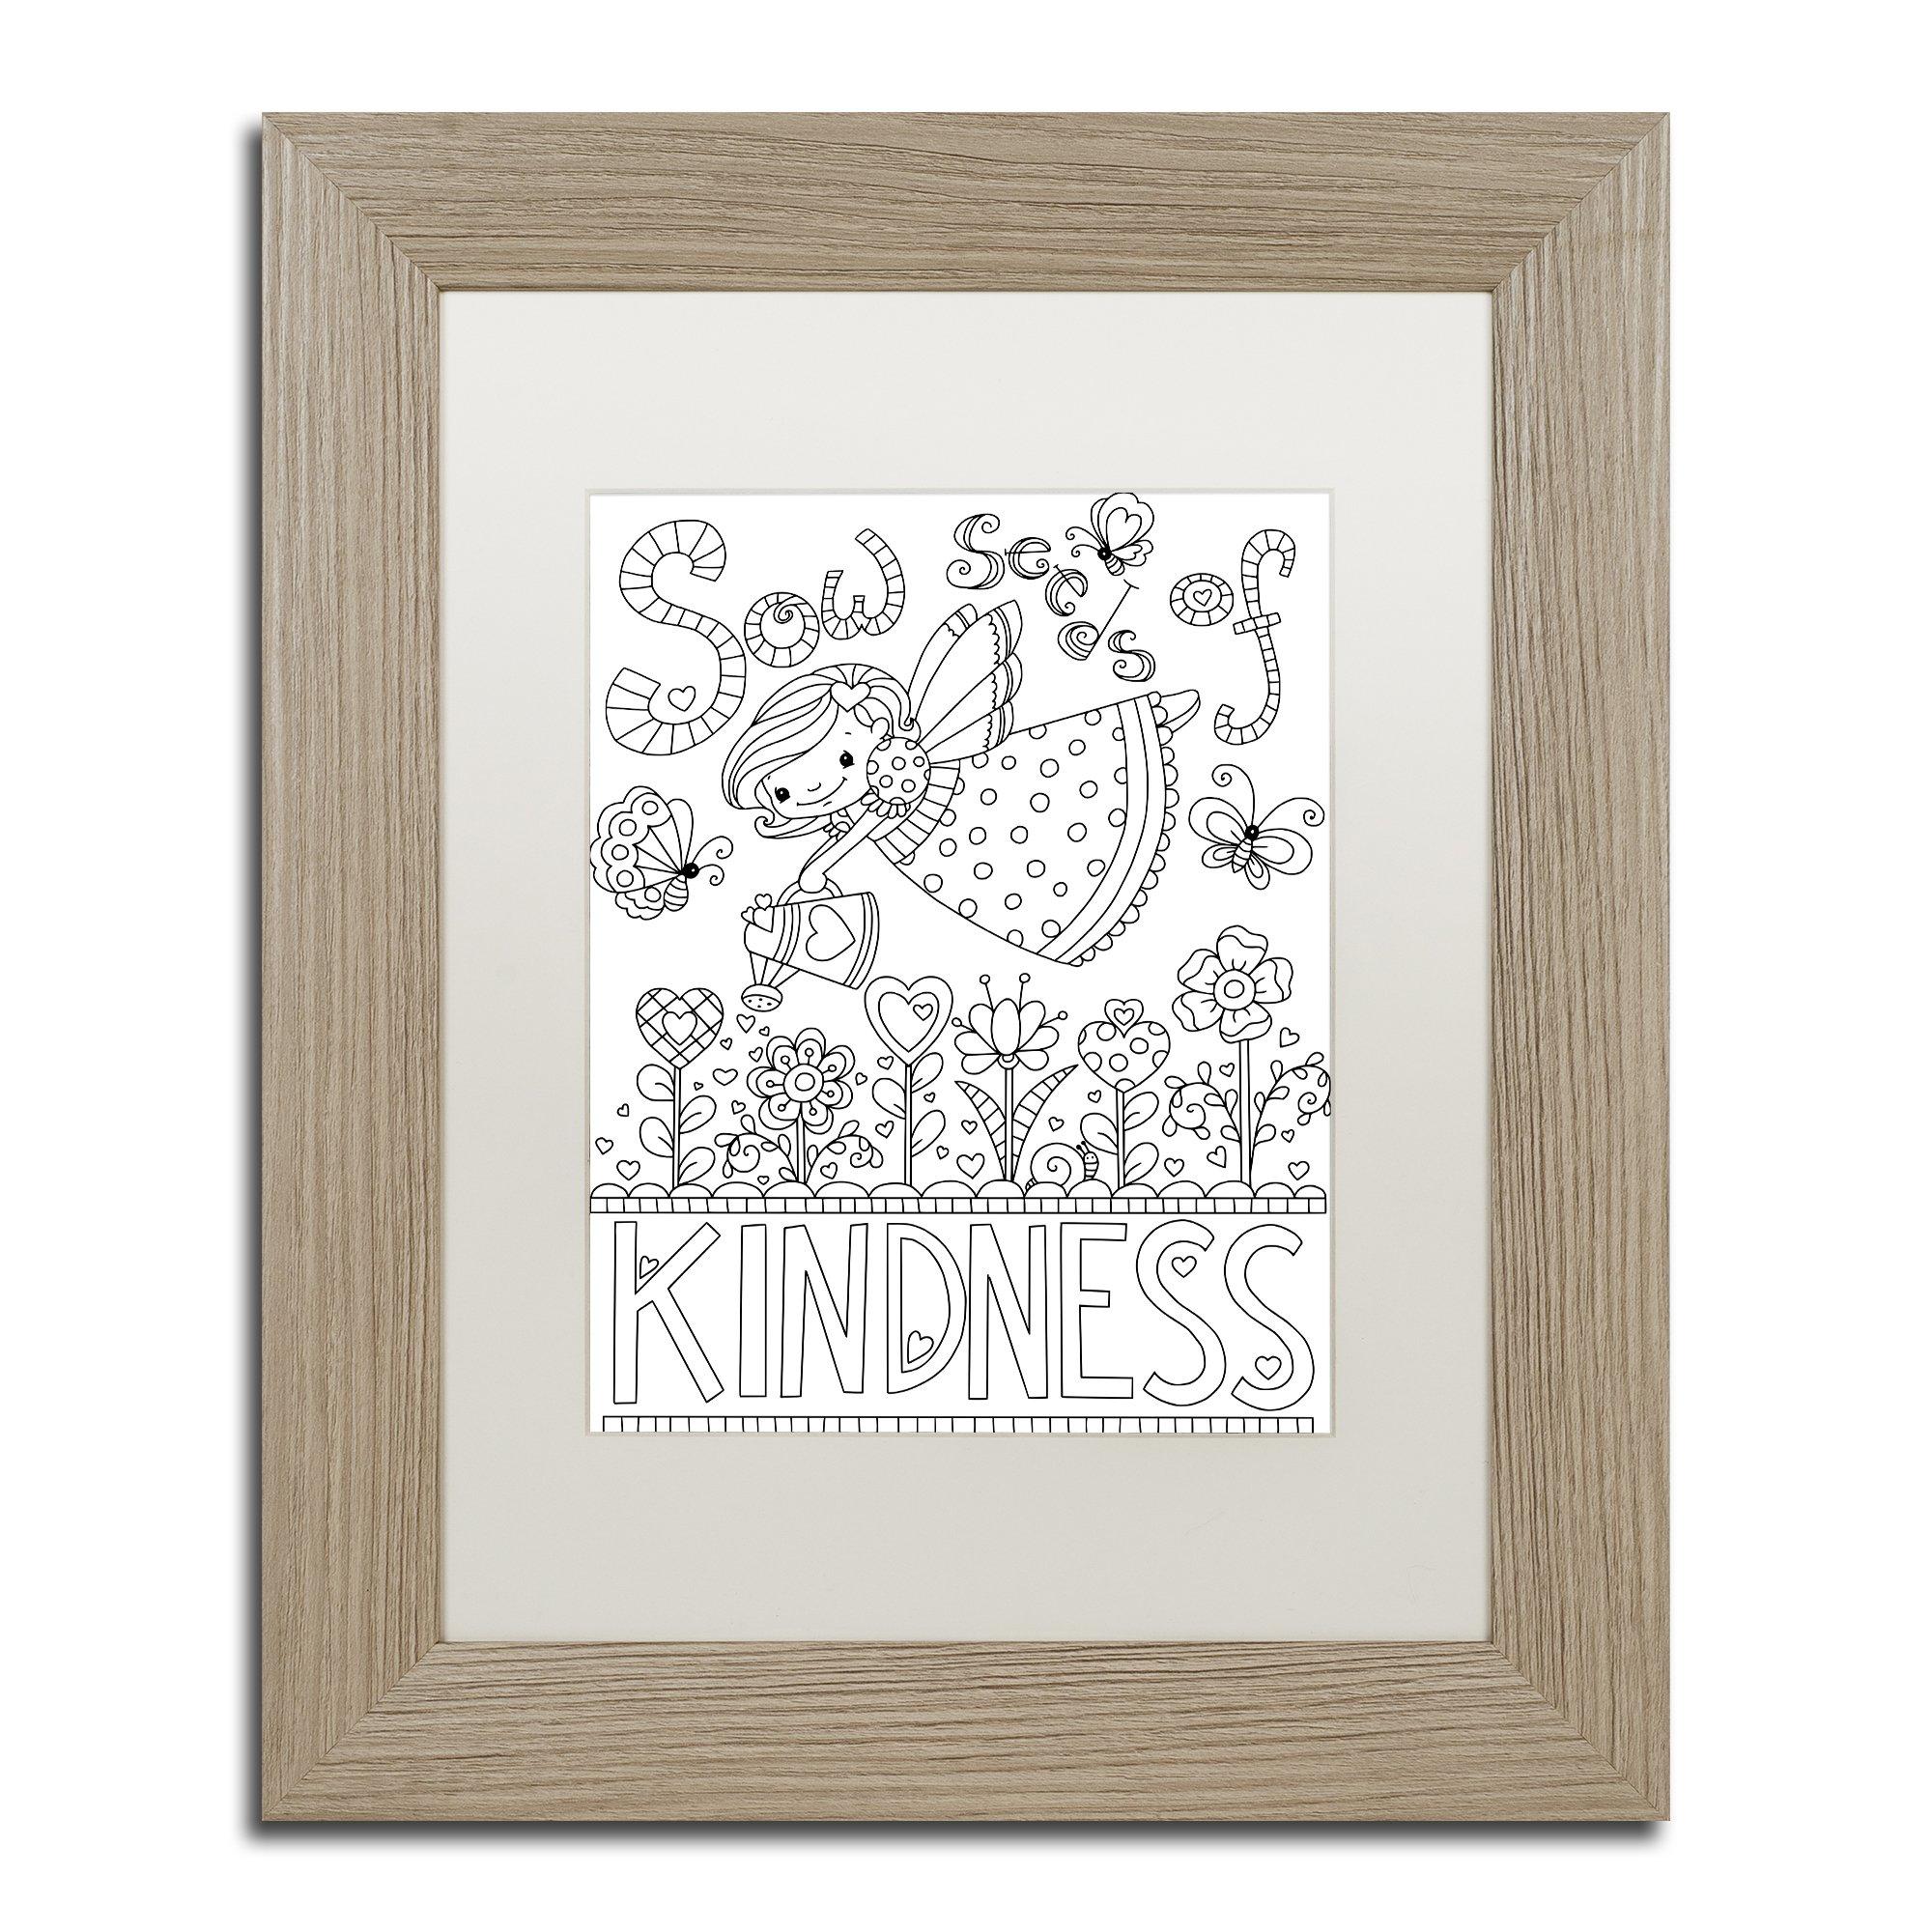 Sow Seeds by Jennifer Nilsson, White Matte, Birch Frame 11x14-Inch by Trademark Fine Art